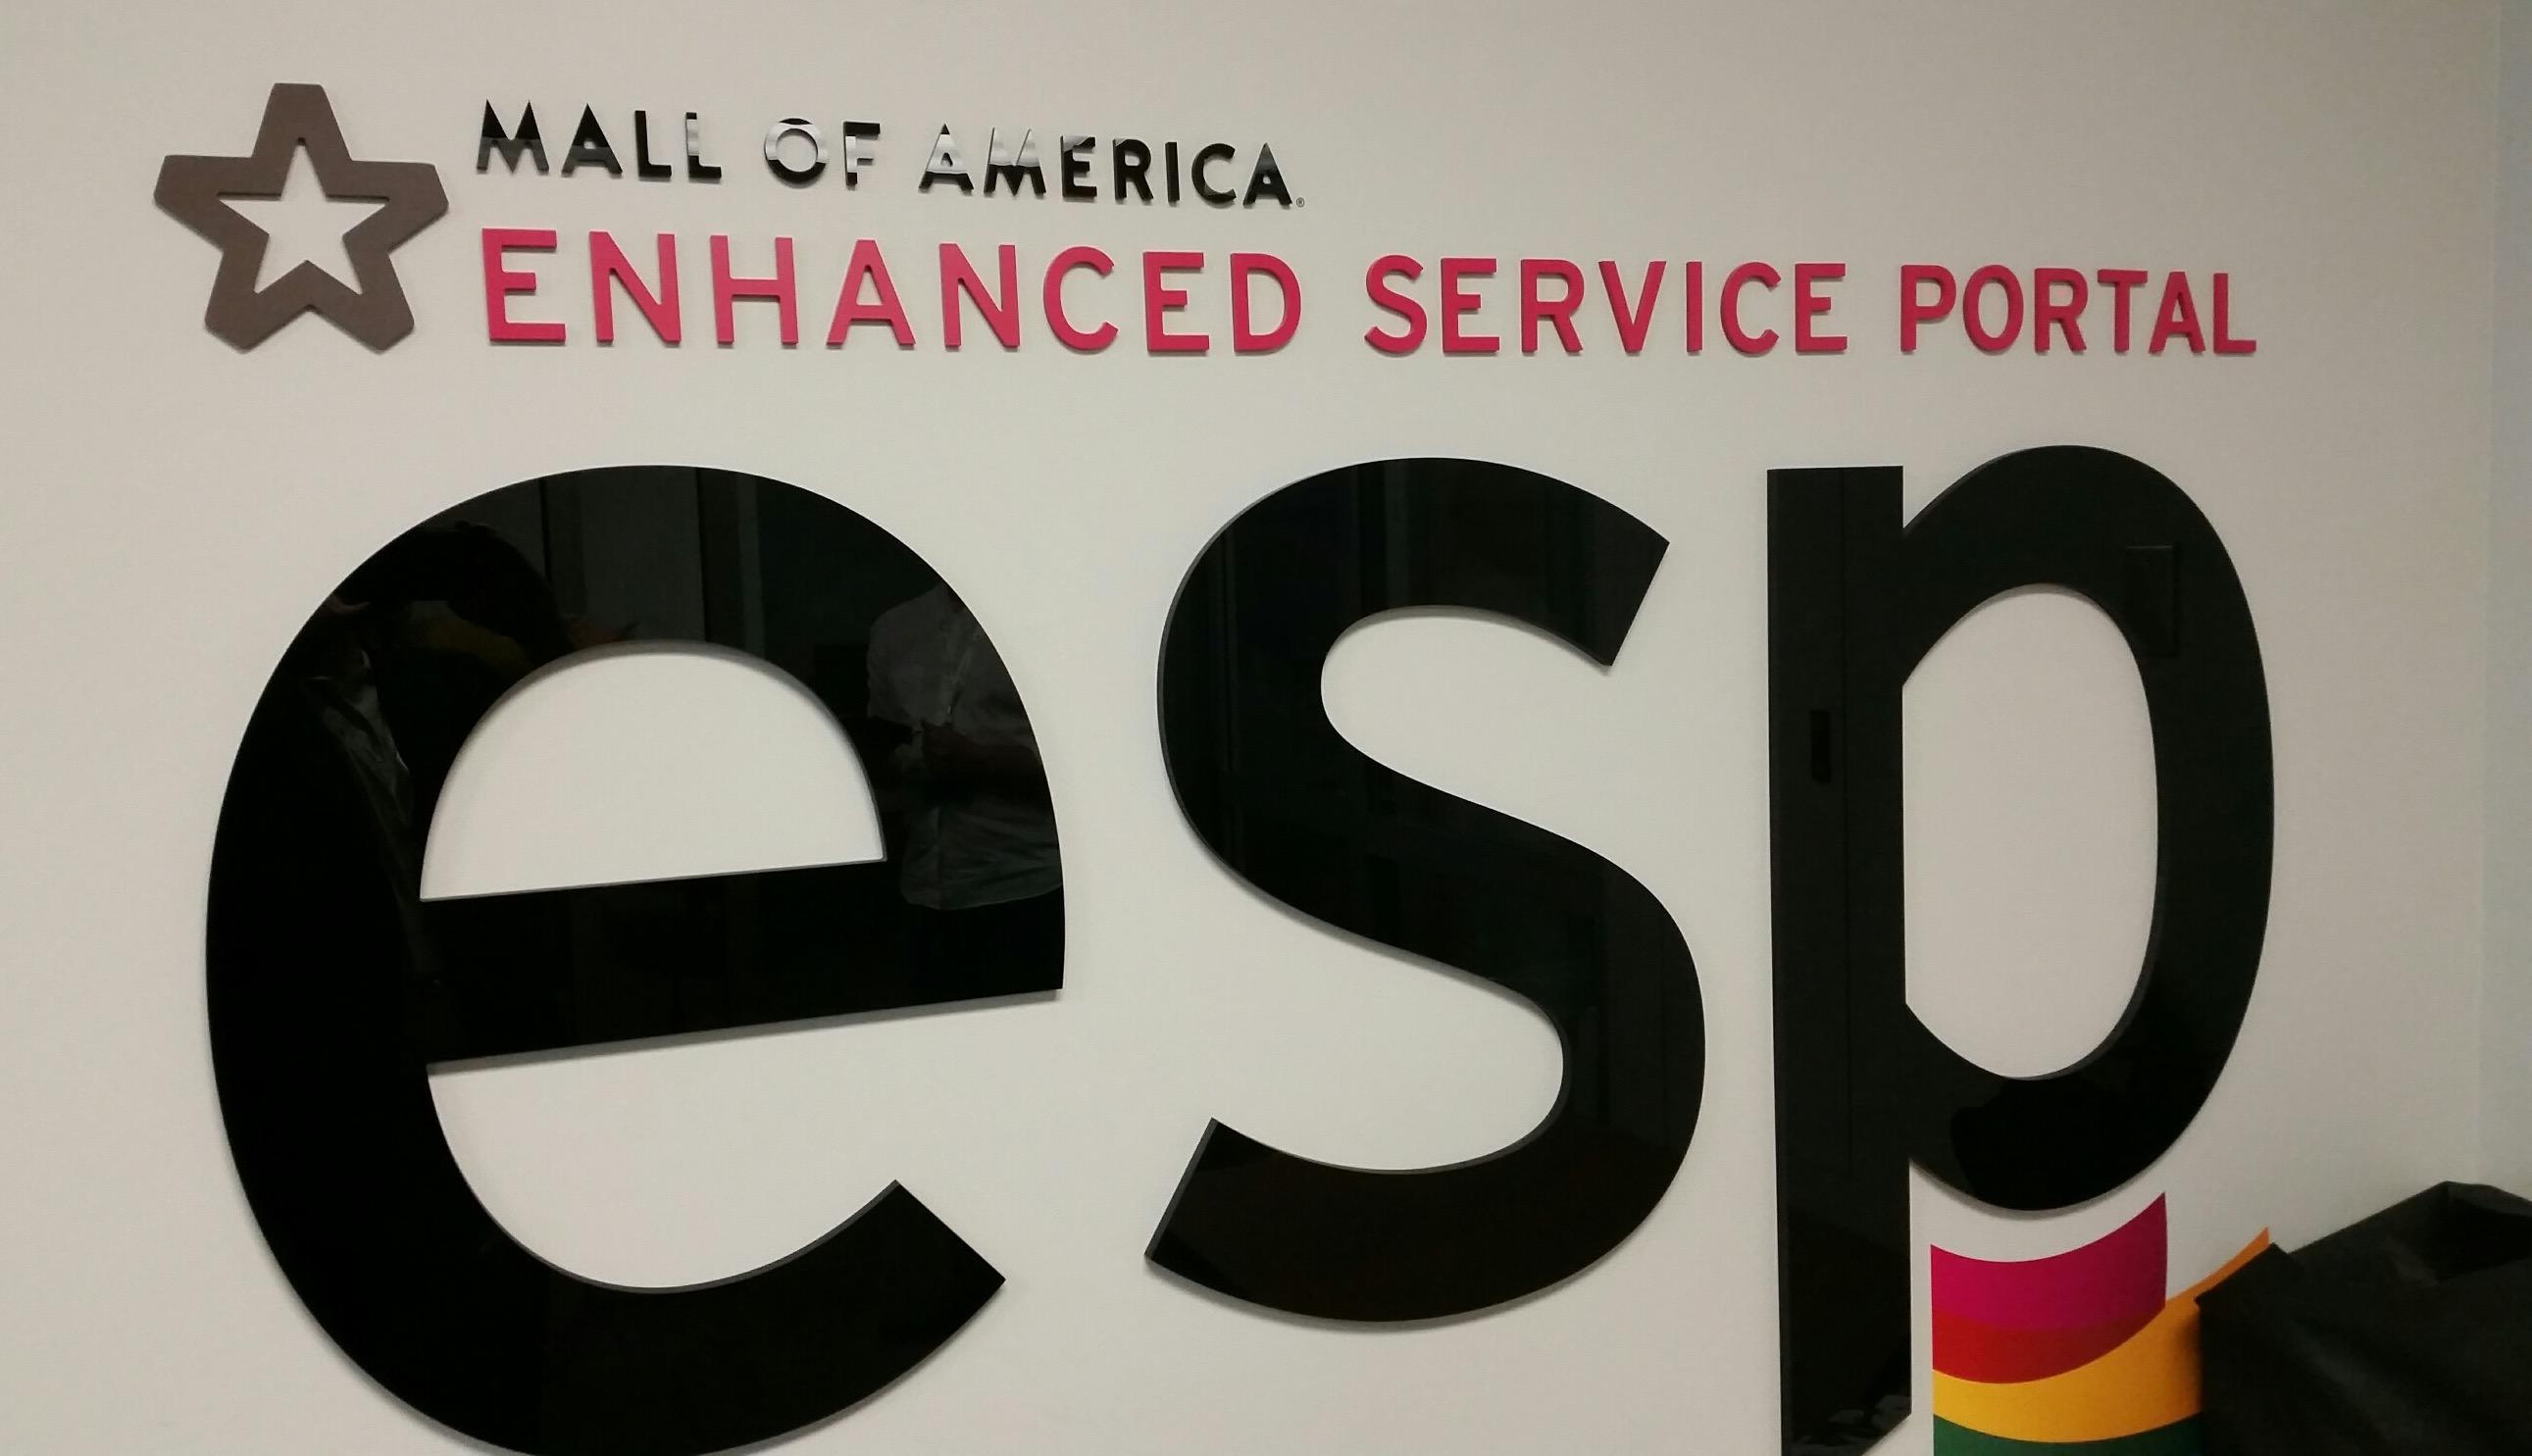 Enhanced Service Portal at Mall of America